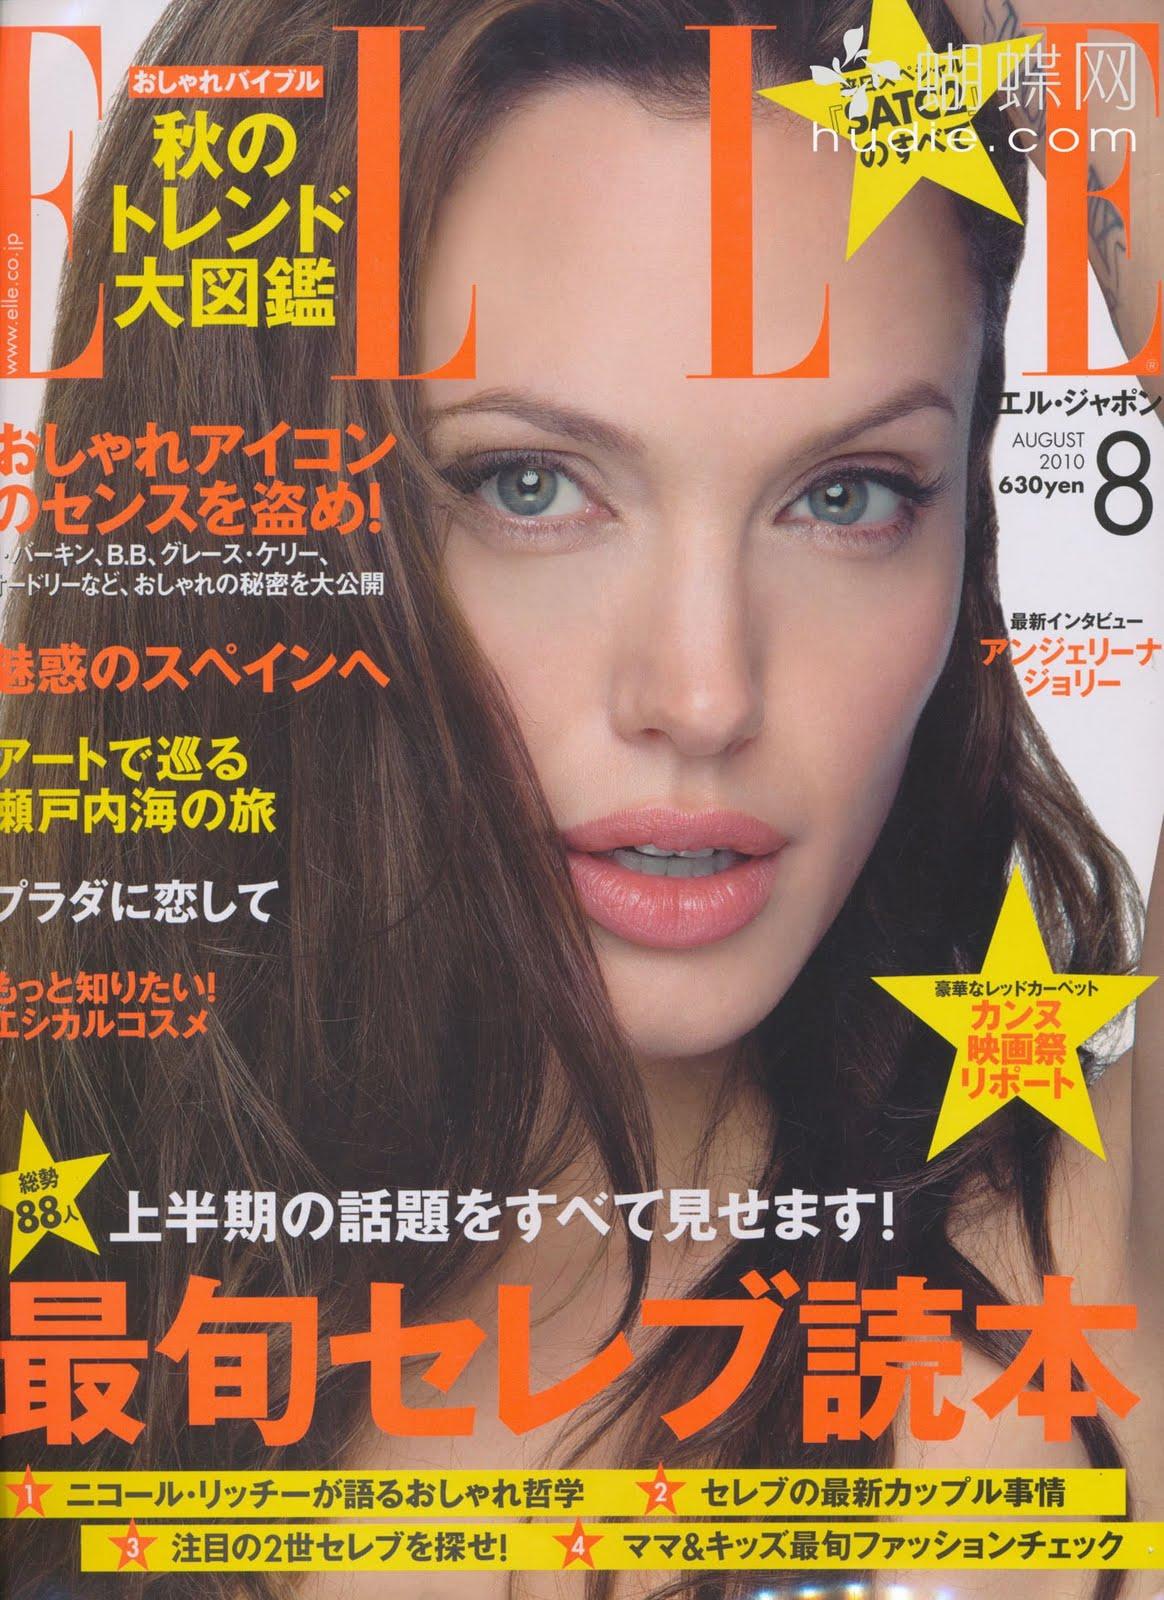 http://3.bp.blogspot.com/_mKeaqyocUS0/TEyky-e99EI/AAAAAAAACHs/VWPMnFR2Dss/s1600/40810_septimiu29_AngelinaJolie_ElleJapan_August20101_122_80lo.jpg